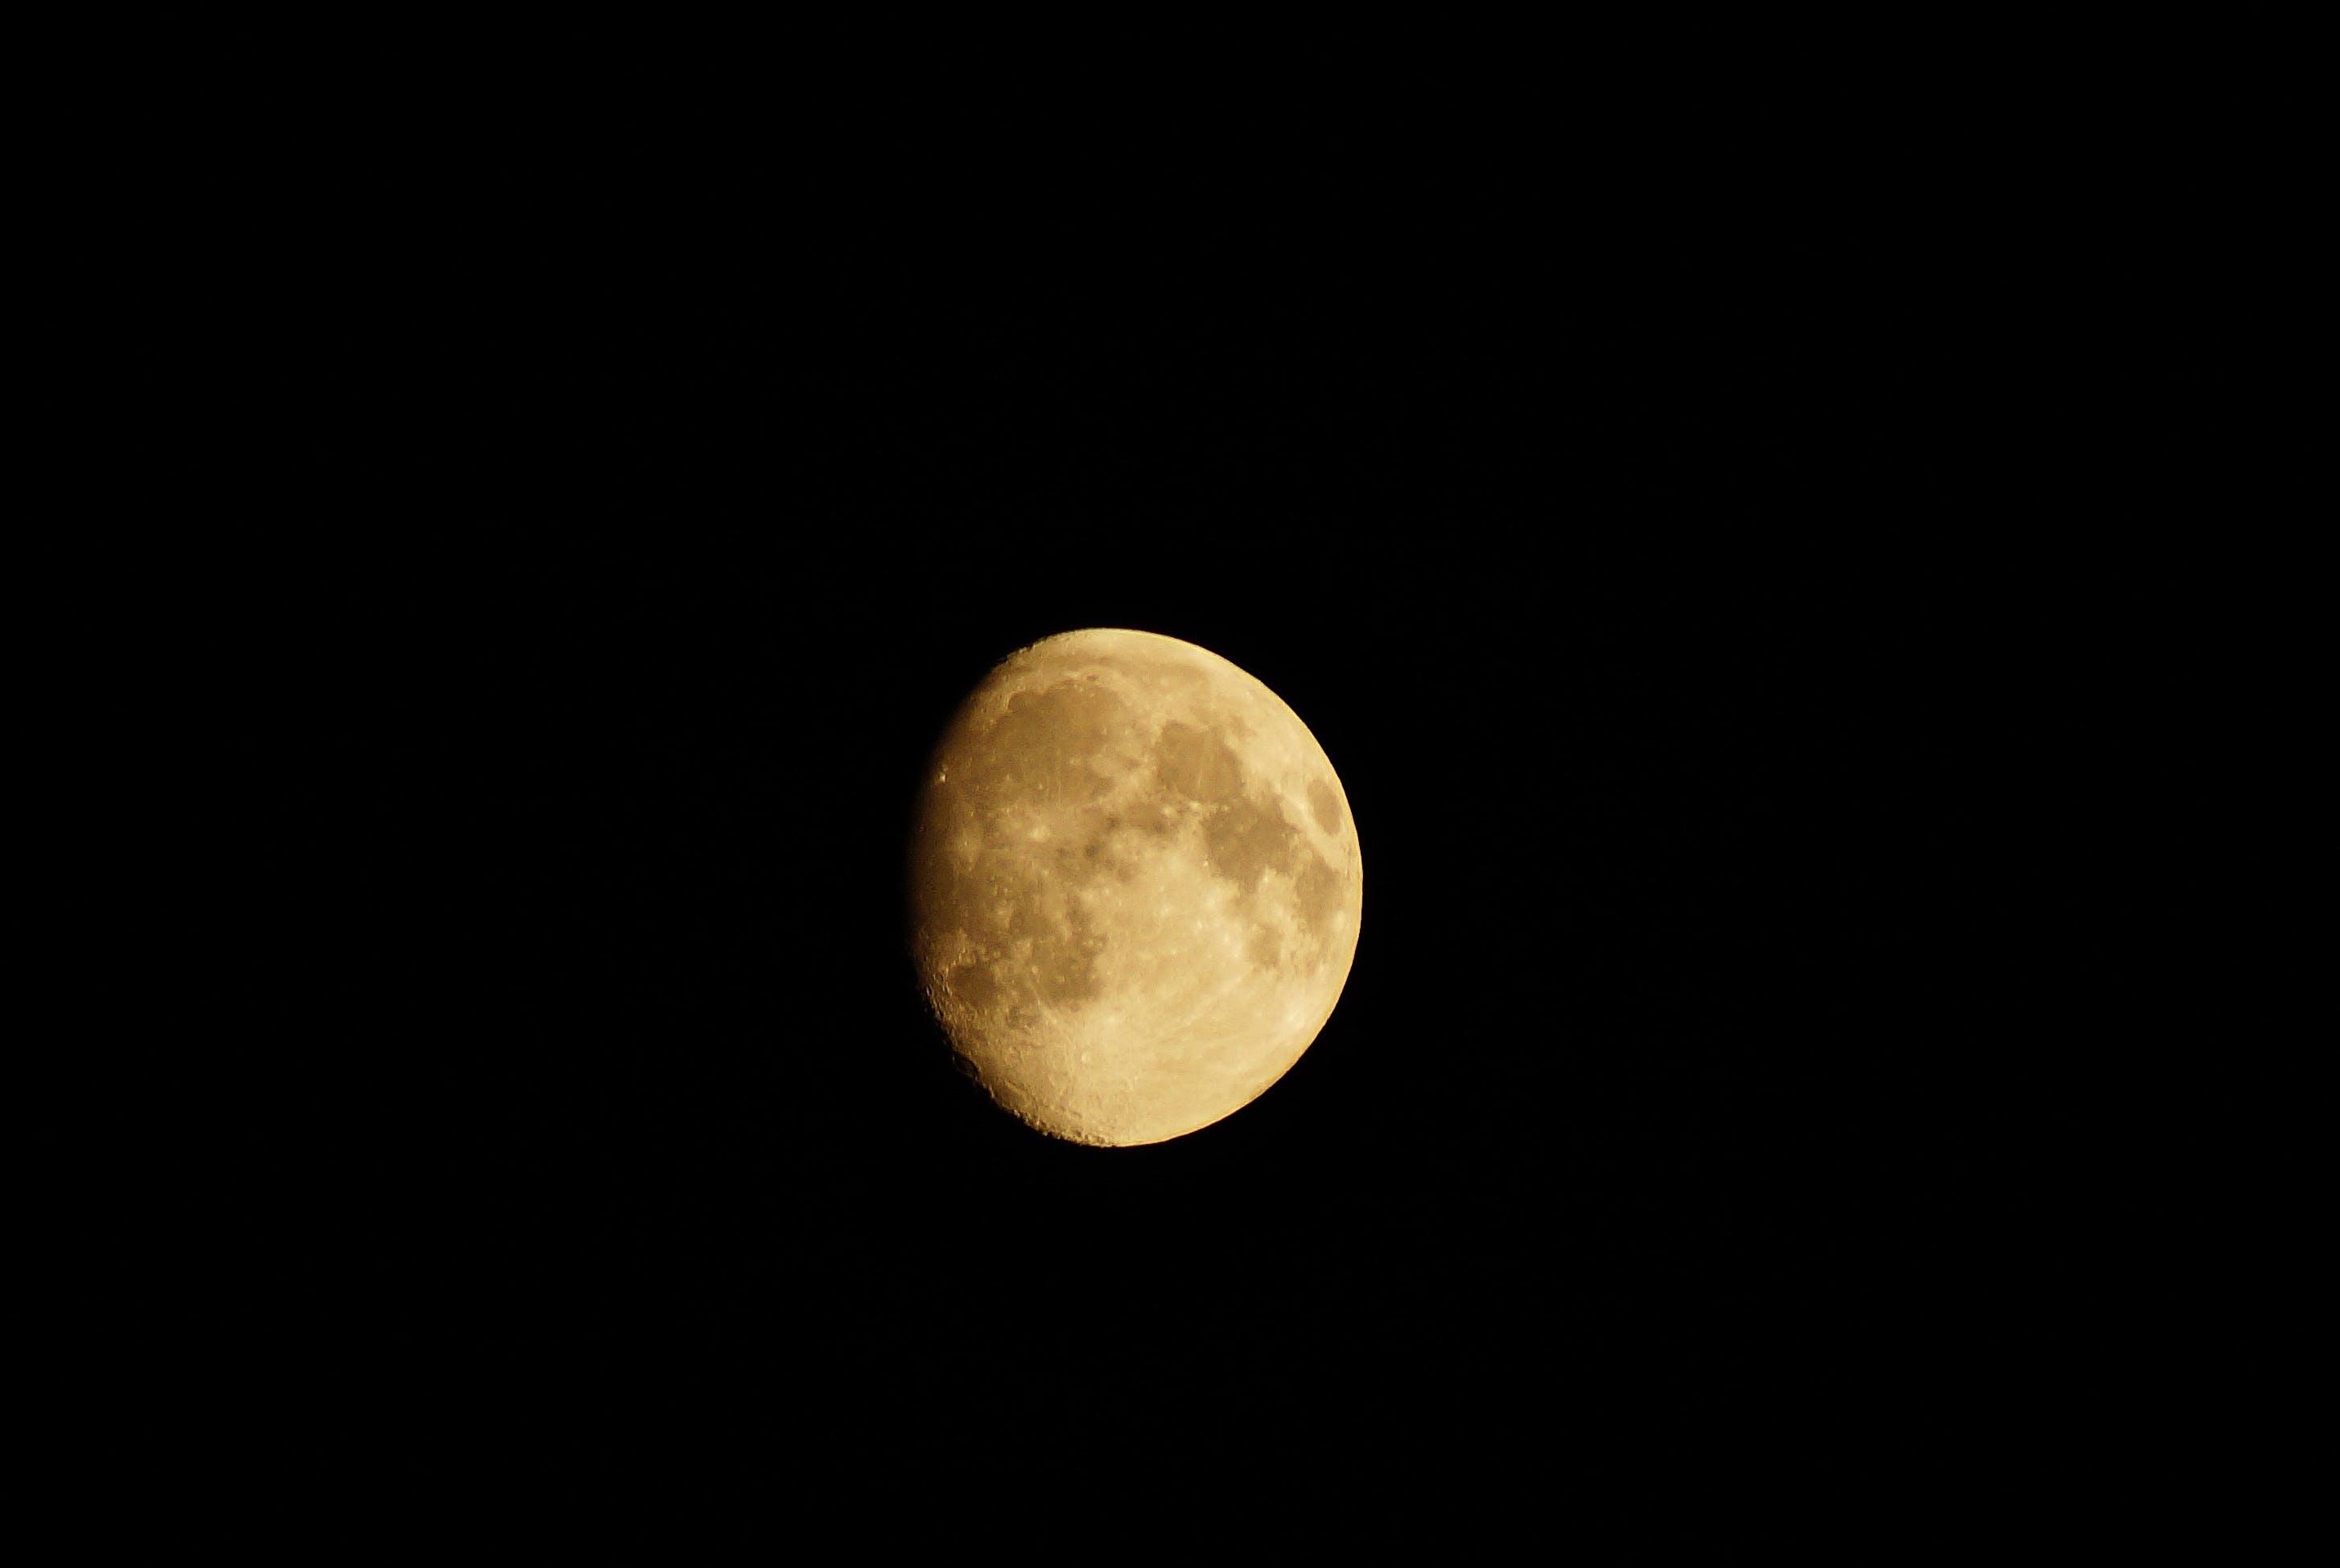 Free stock photo of space, dark, moon, science